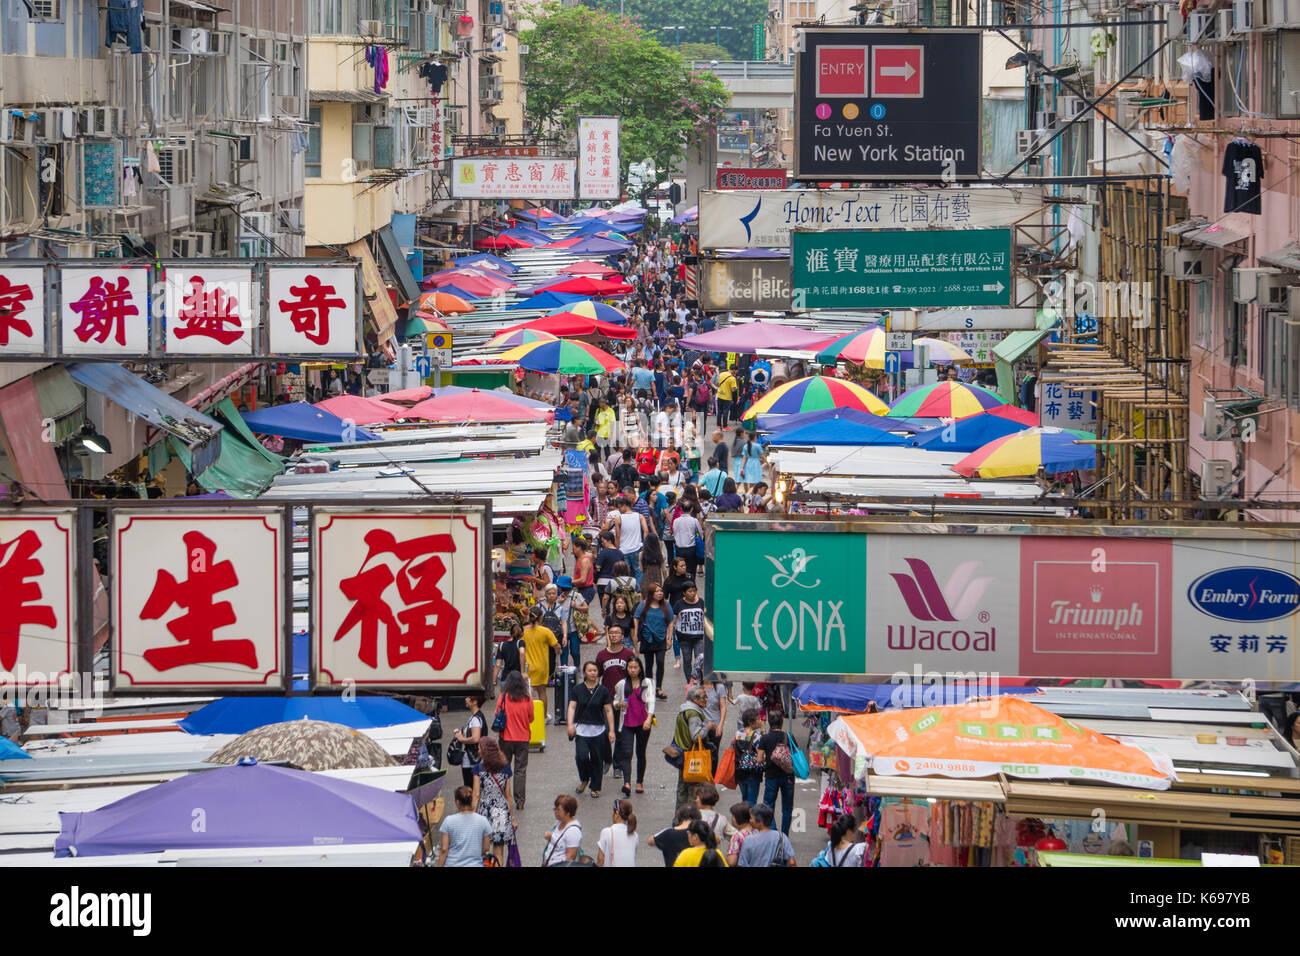 People shopping at a street market in Hong Kong - Stock Image